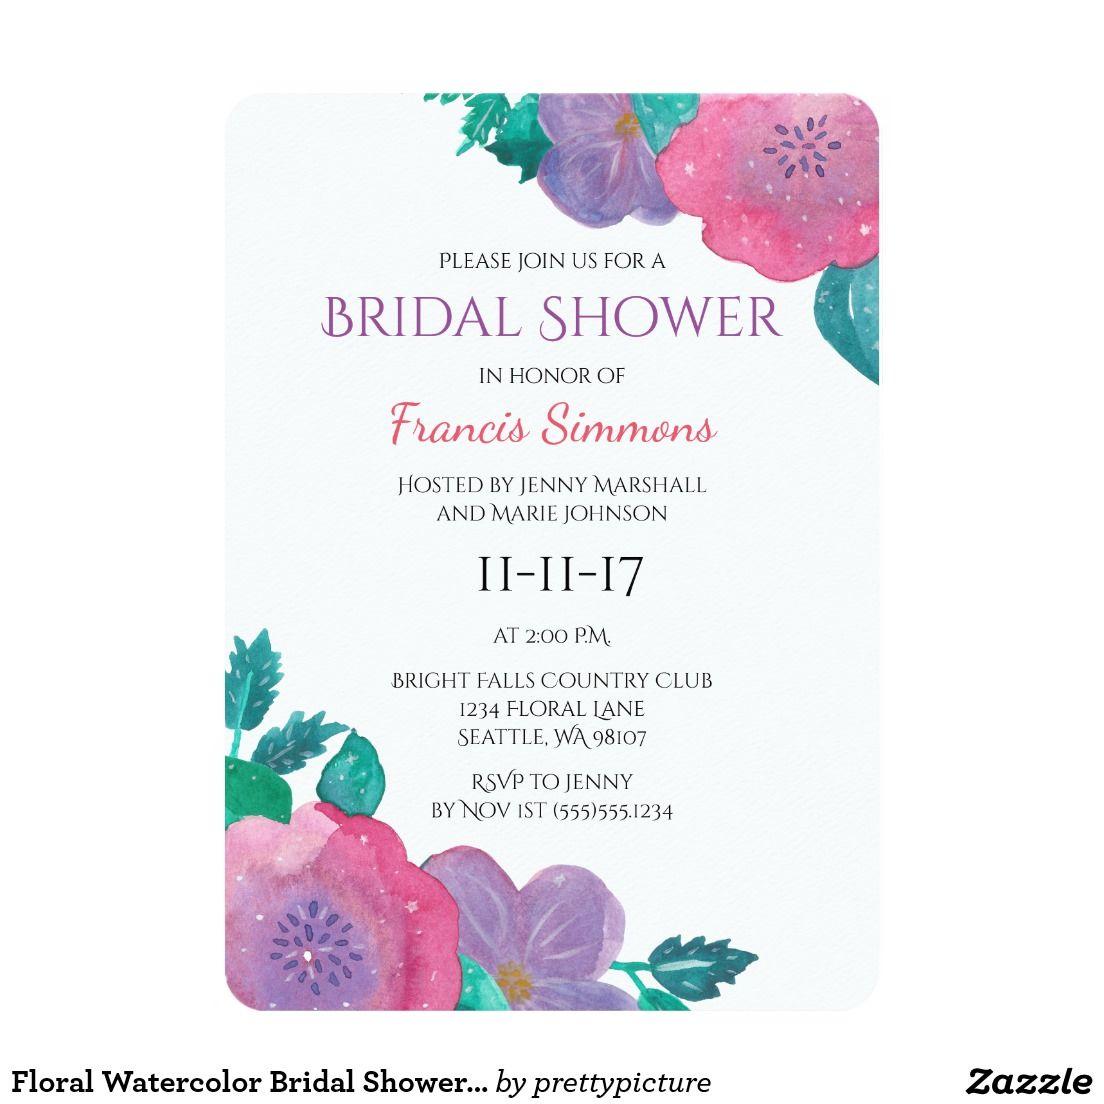 Floral Watercolor Bridal Shower Invitation Wedding Invitations